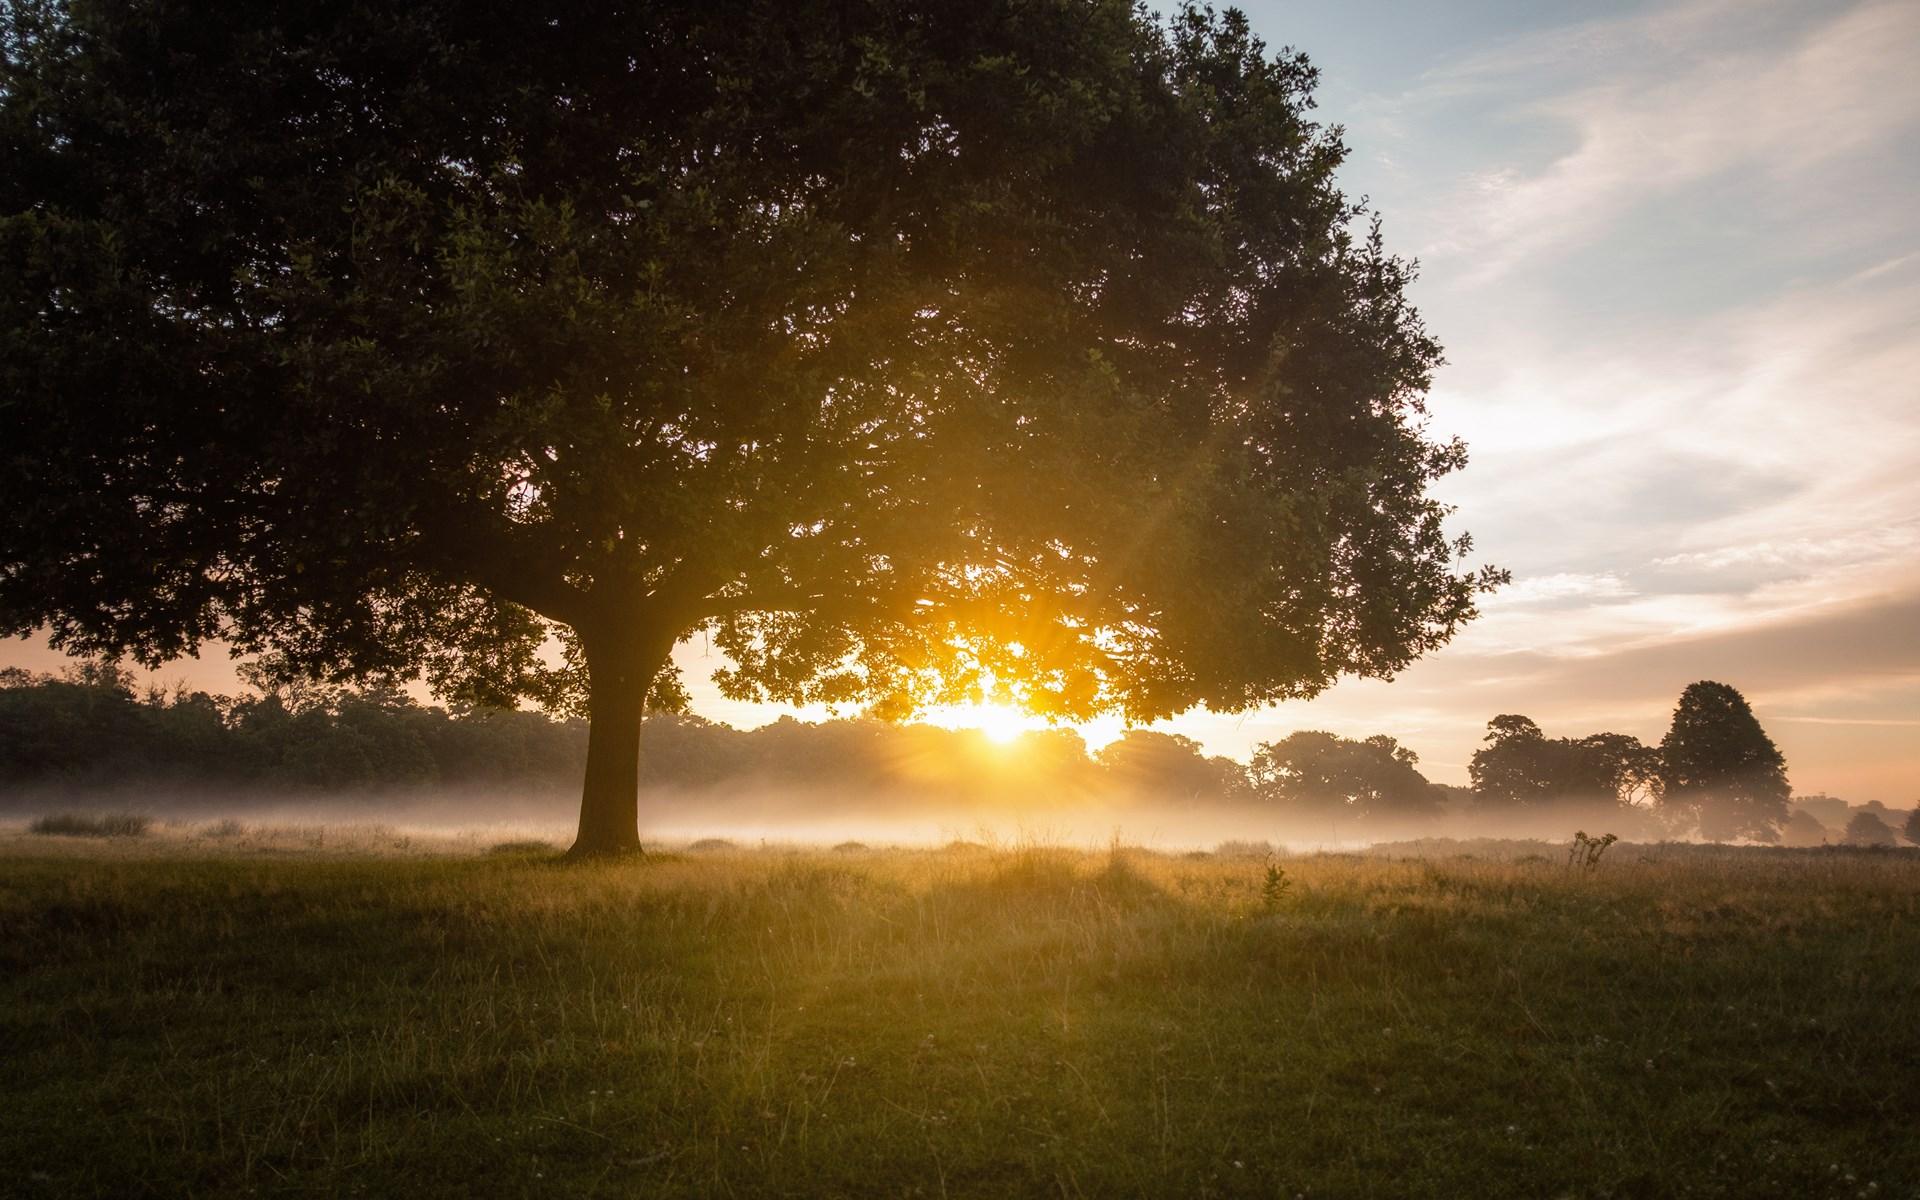 Tree in Pasture